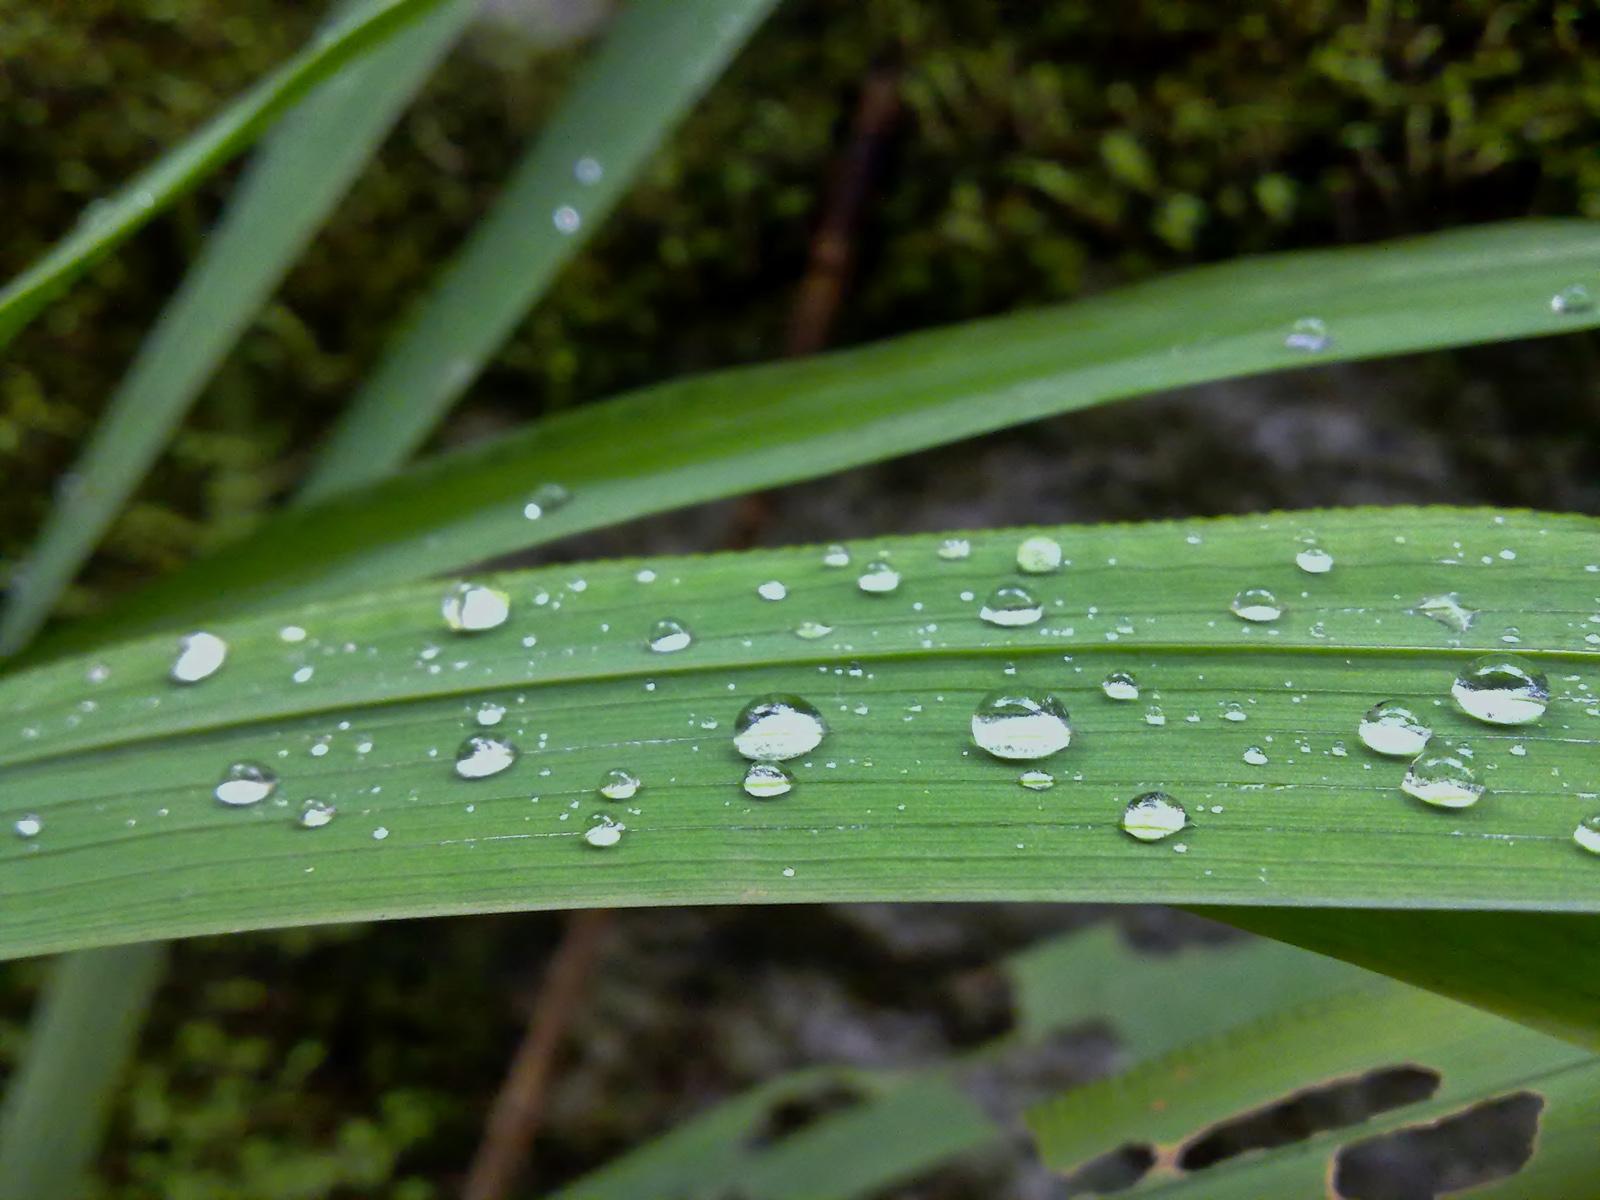 Water drops photo